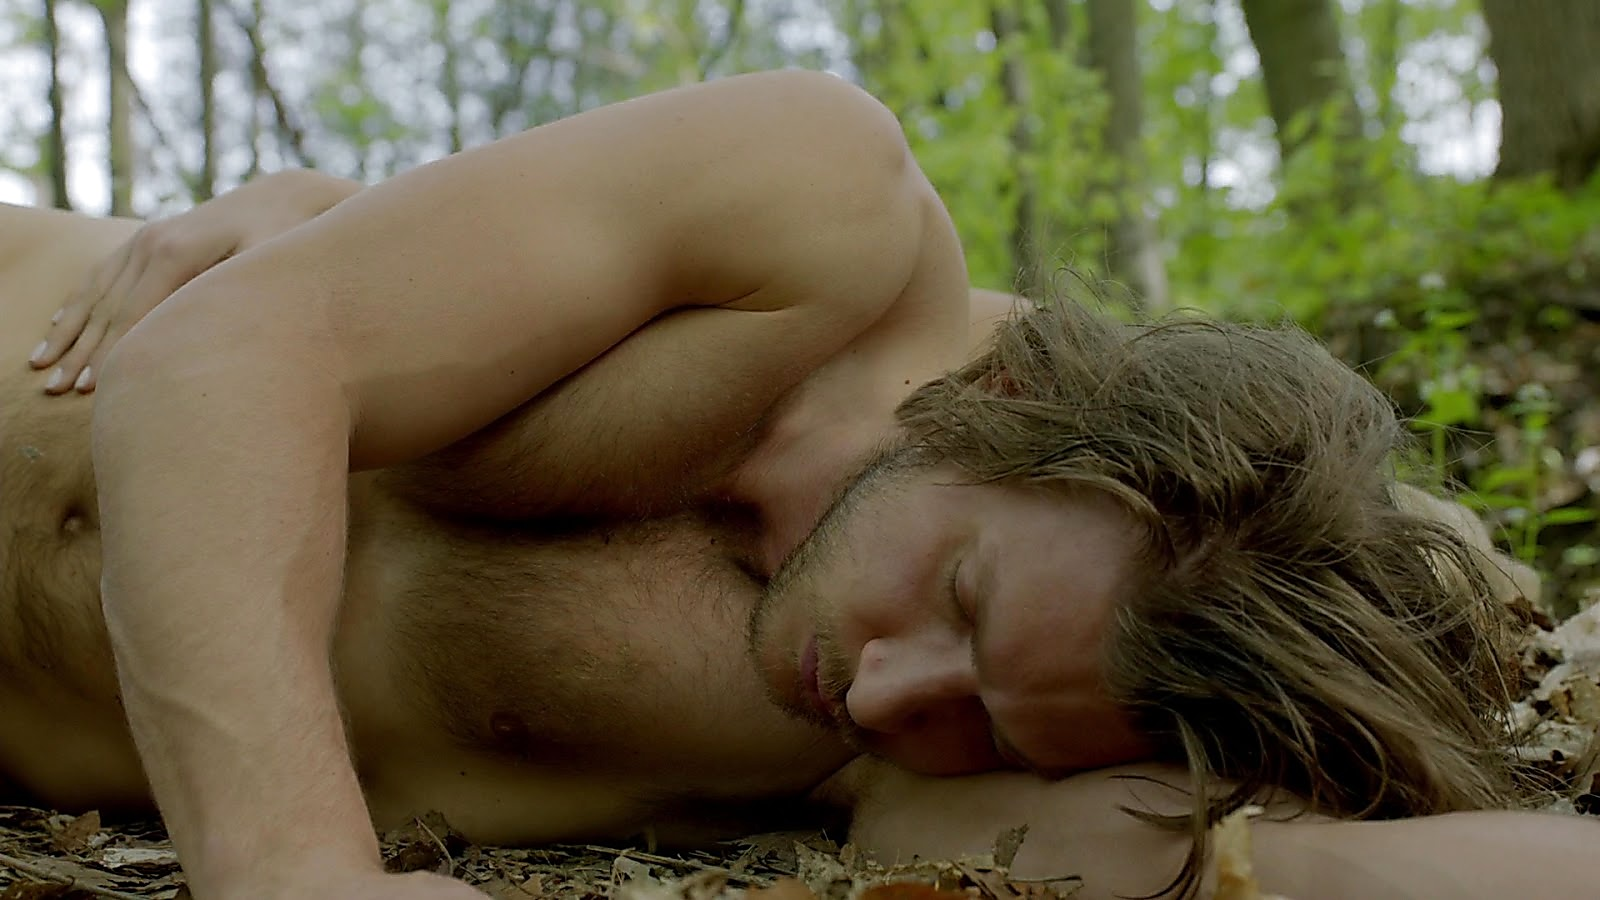 Greyston Holt sexy shirtless scene April 12, 2020, 9am